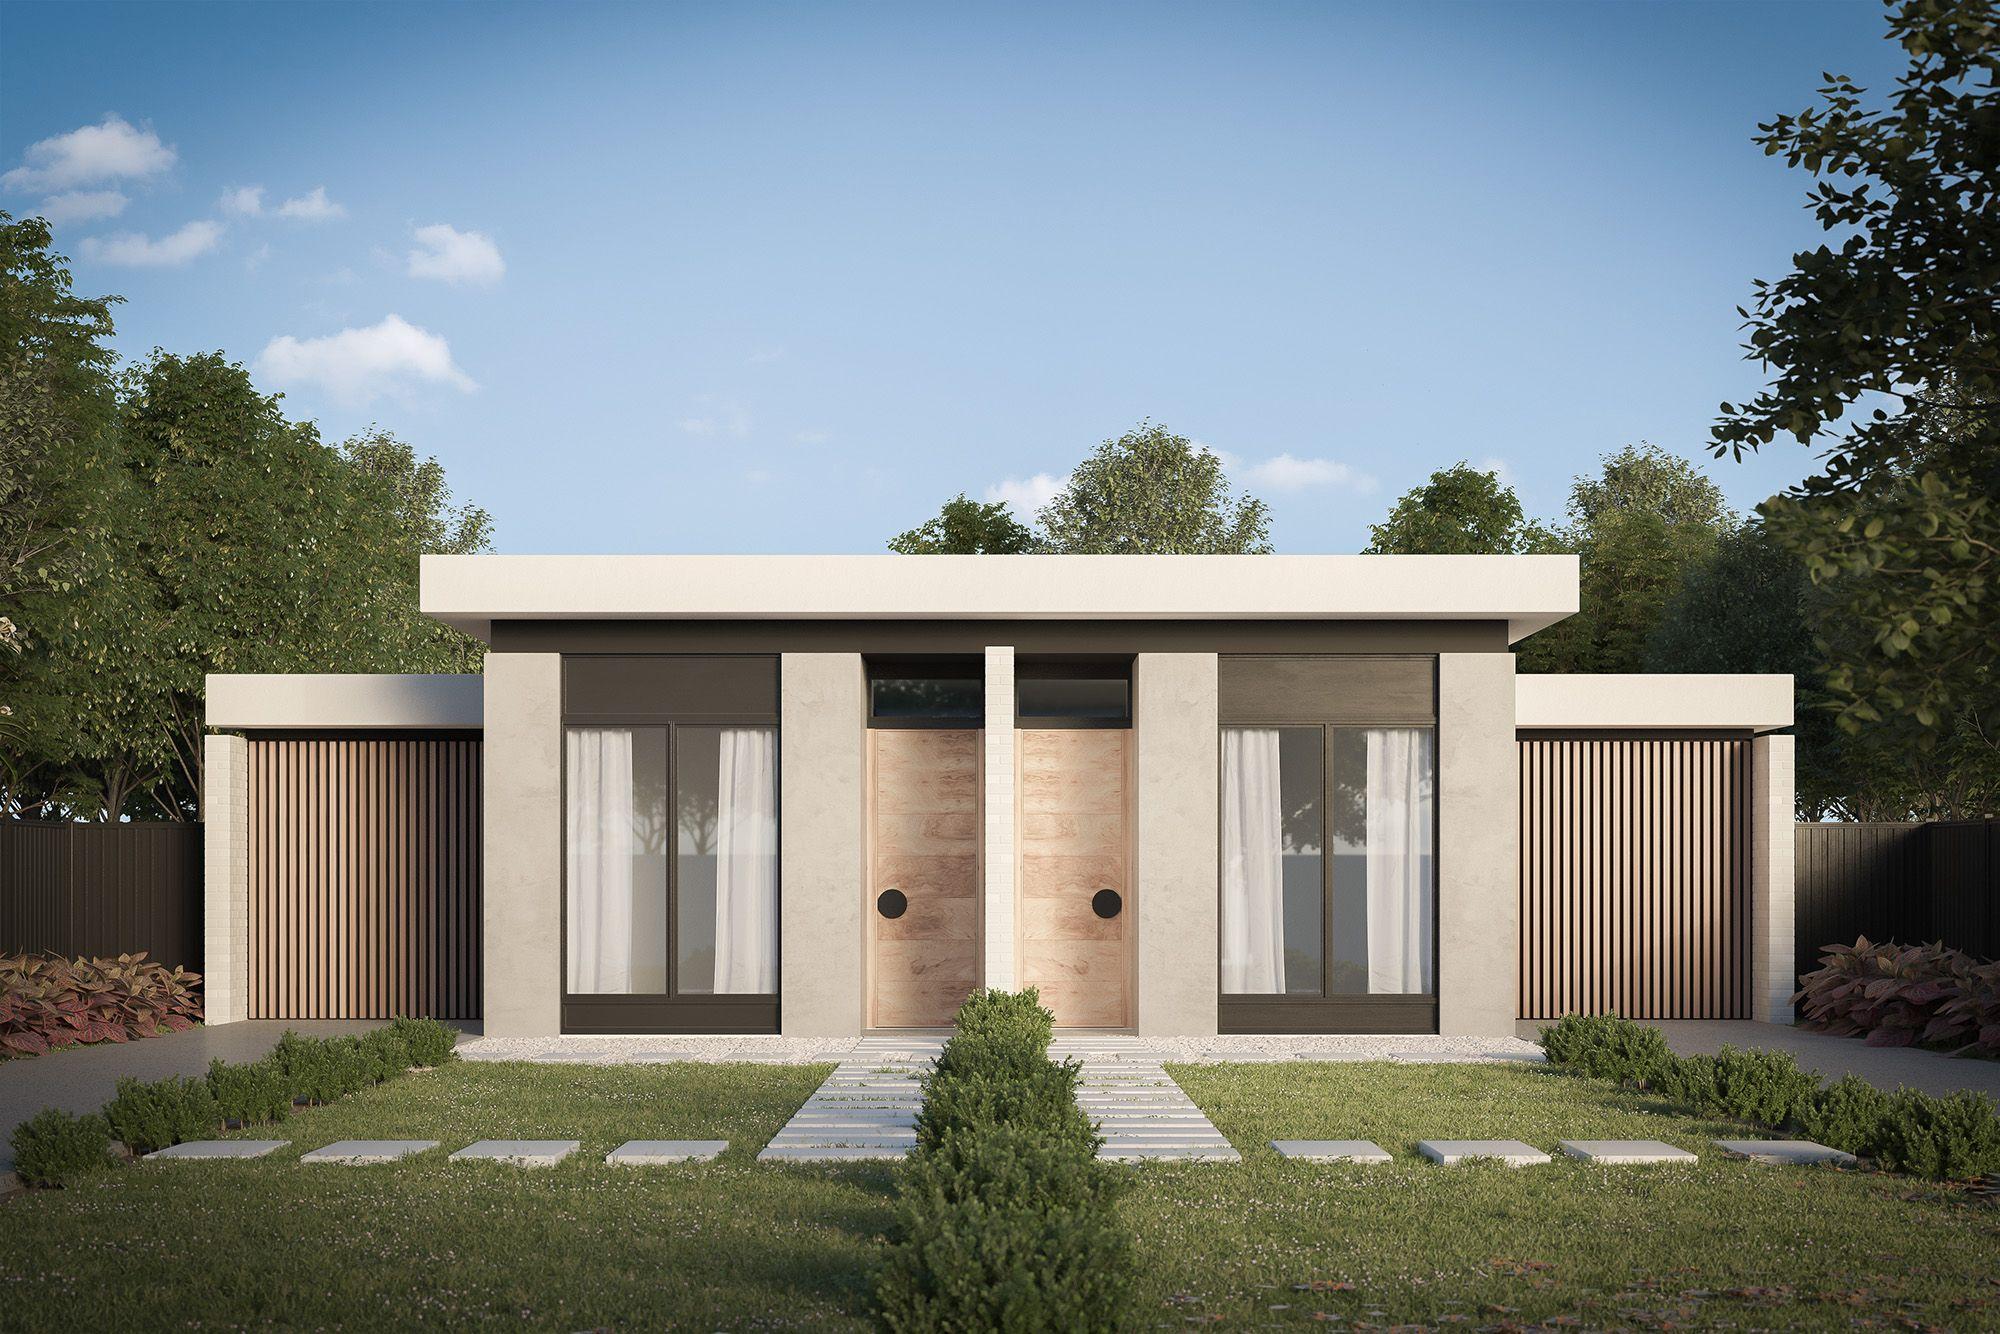 Mink Homes - Duplex Designs - Melbourne, Victoria — rdvisualisation | 3D Rendering & Architectural Virtual Tour Rendering Gold Coast, Brisbane, Sydney, Melbourne, Perth